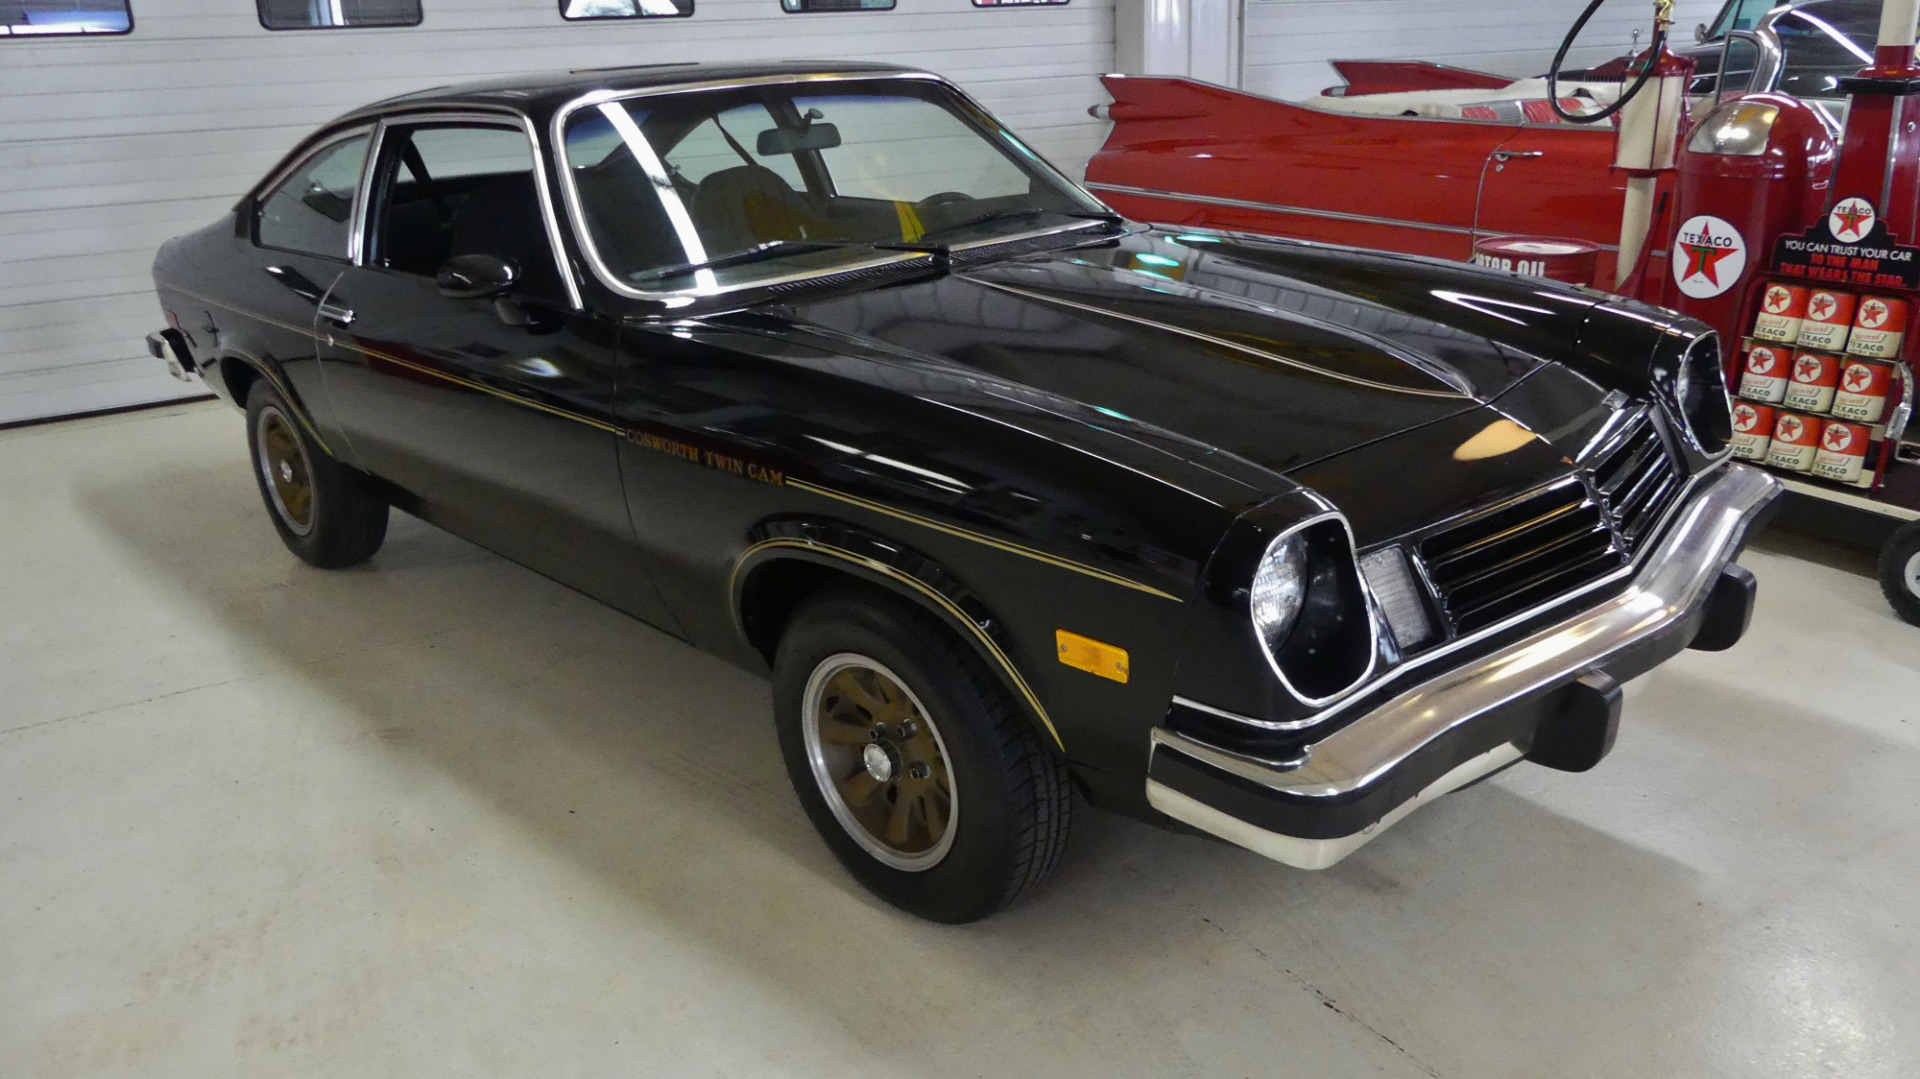 1975 Chevrolet Vega Cosworth 0735 4925 Miles Black 2 Dr